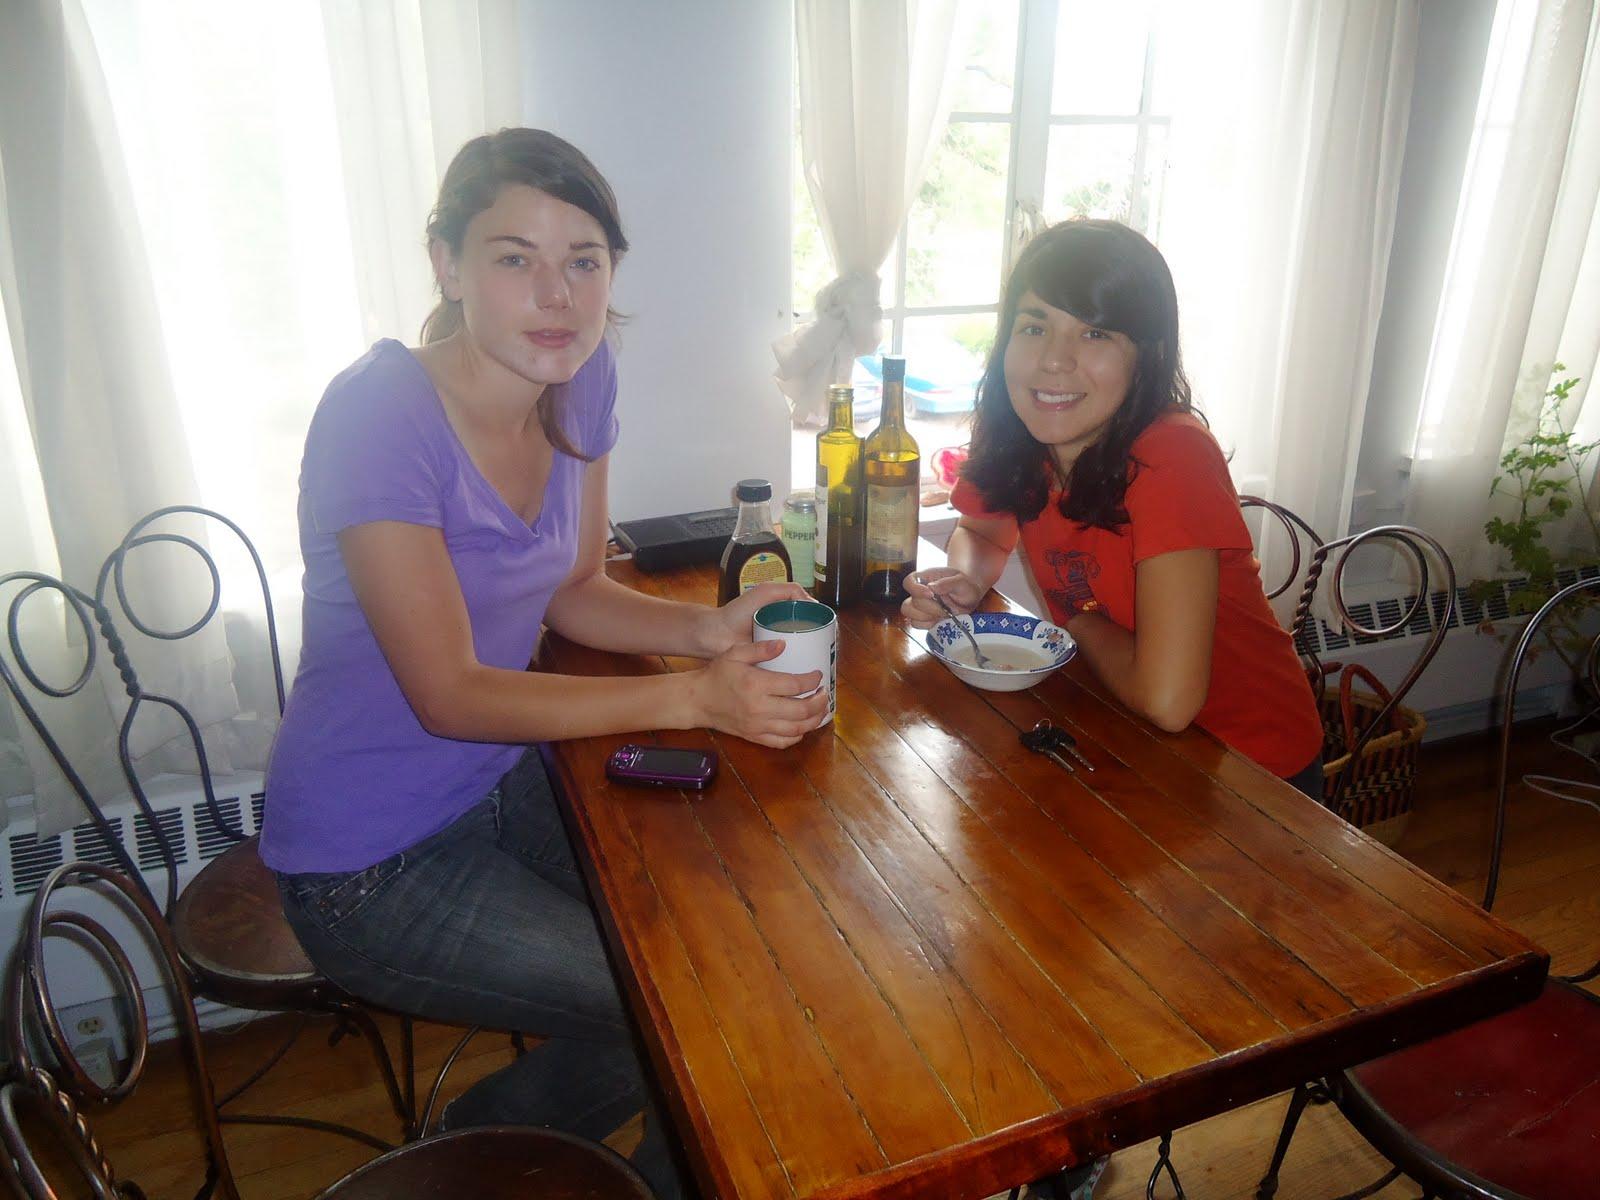 w4m casual encounters craigslist personals casual encounters Brisbane